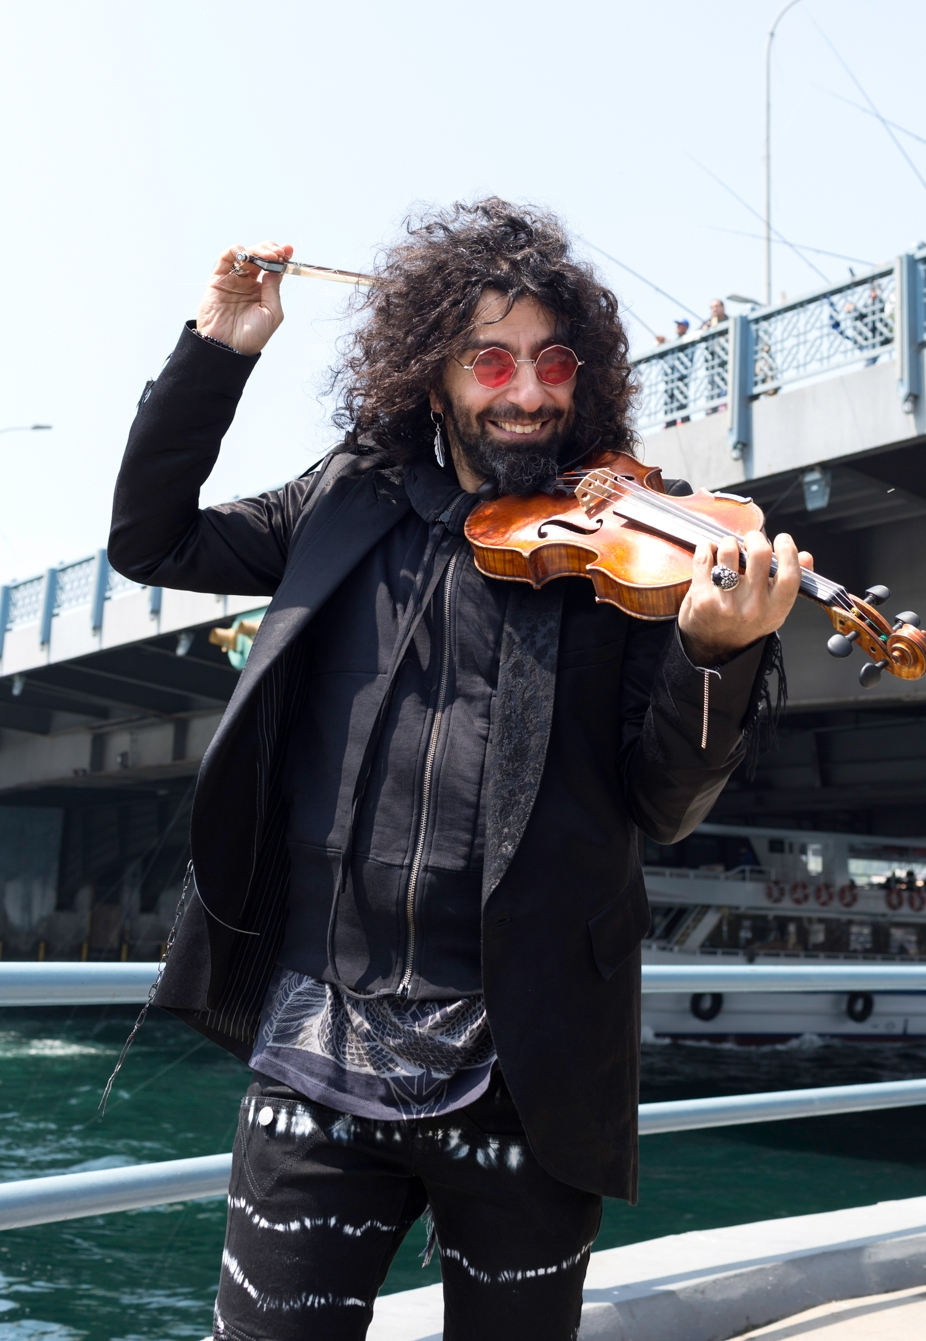 Ara Malikian  - A planet in a Violin Case, Tavli I Istanbul